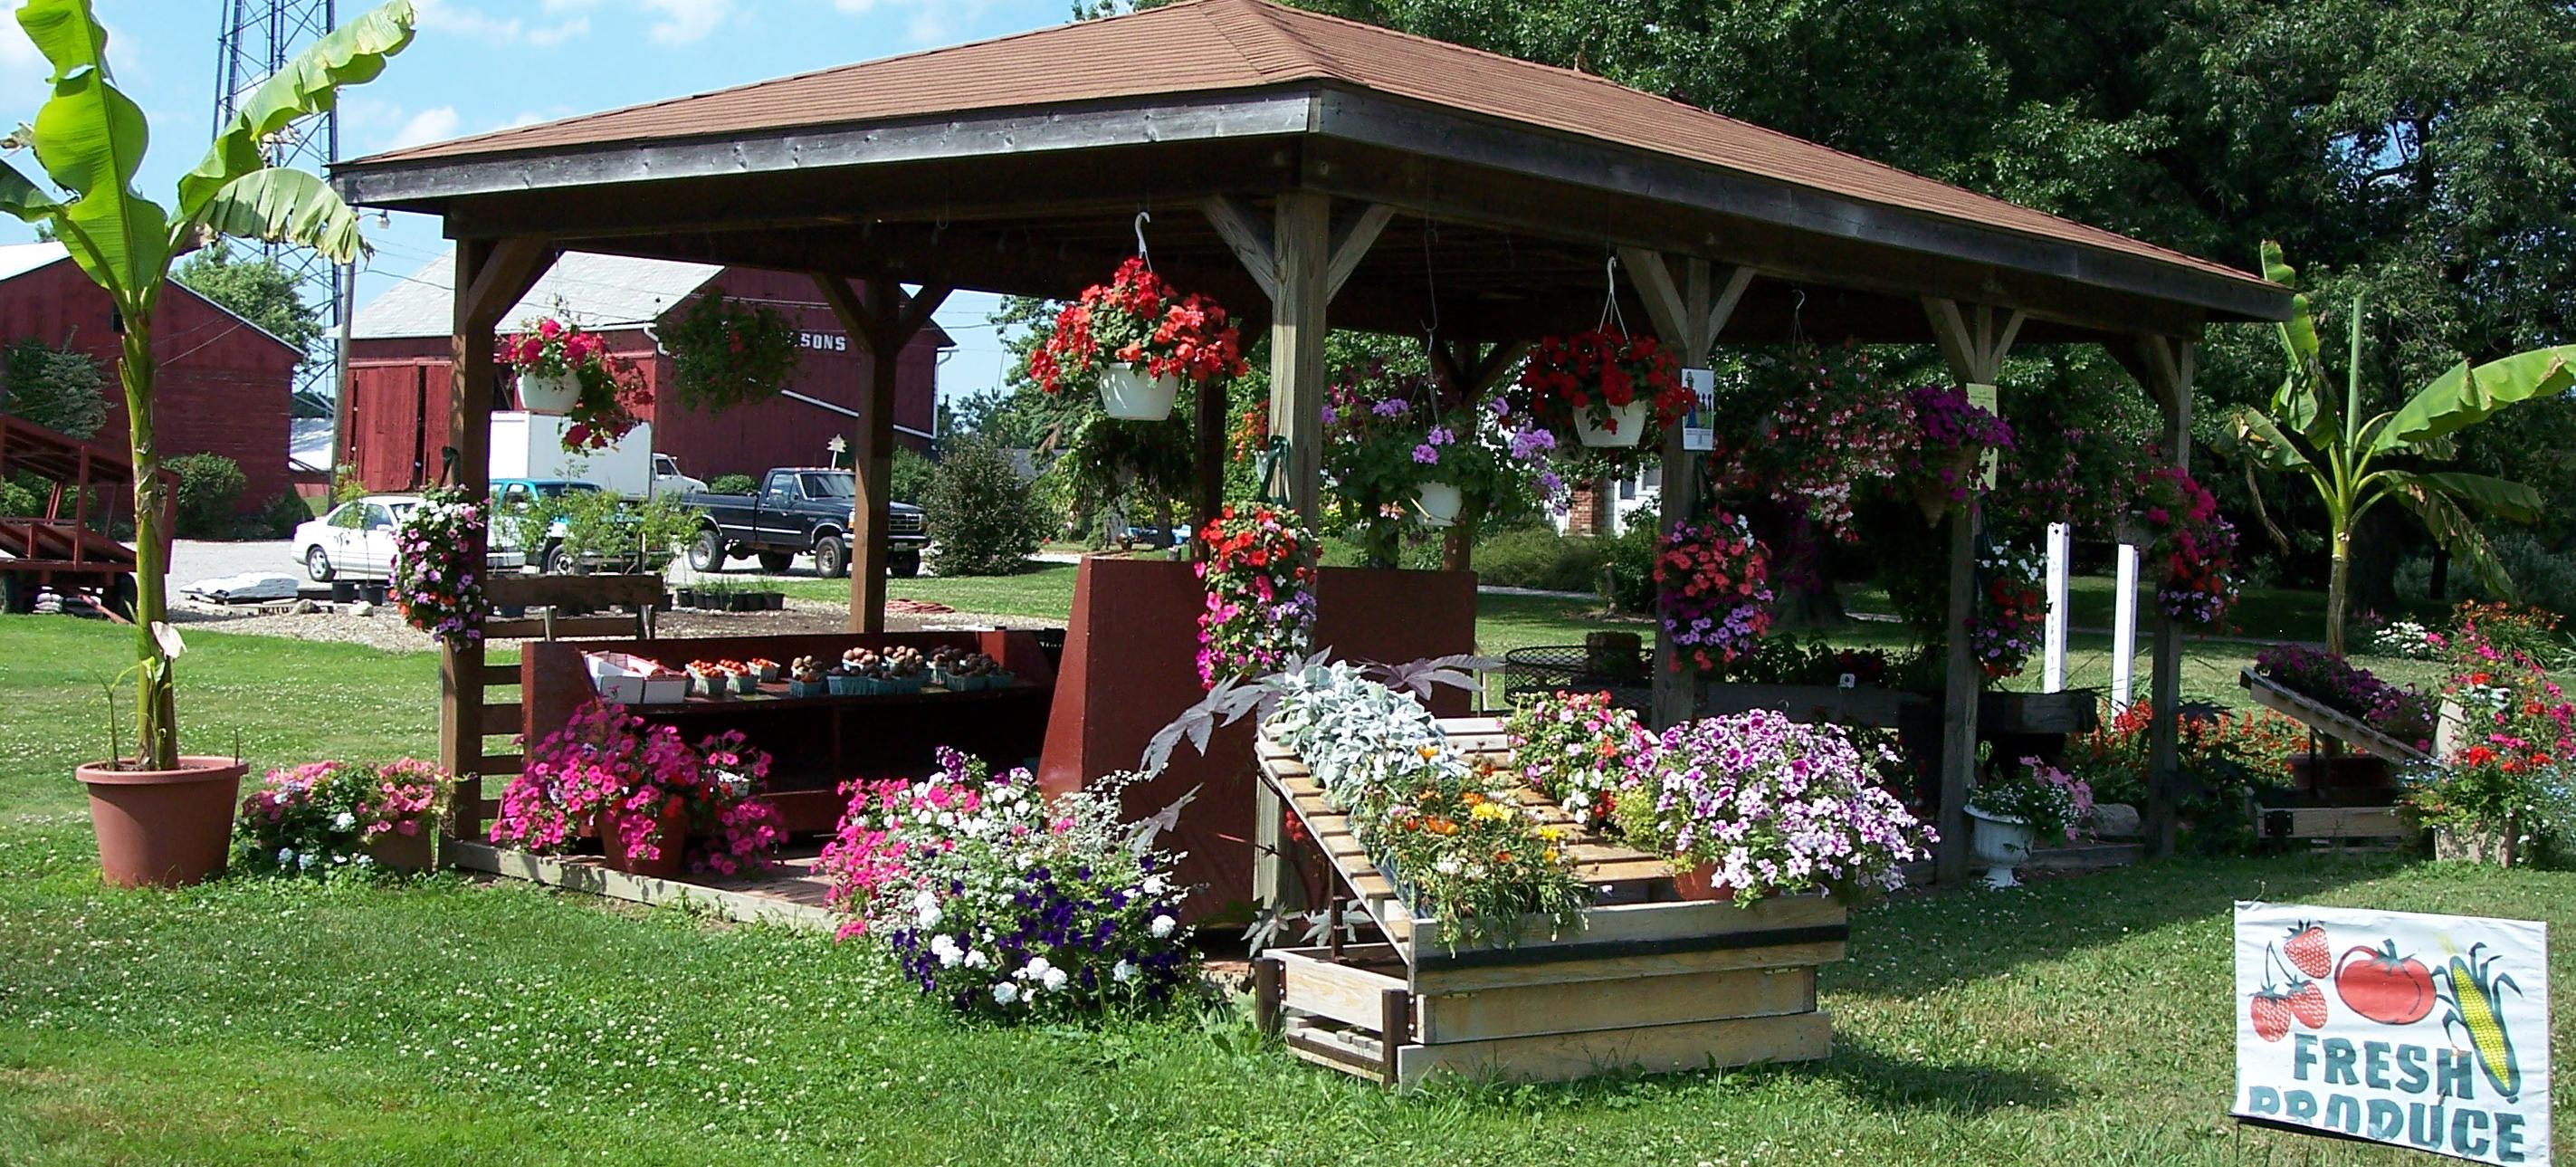 The greenhouse richardson - Richardson Farms Fruit Stand